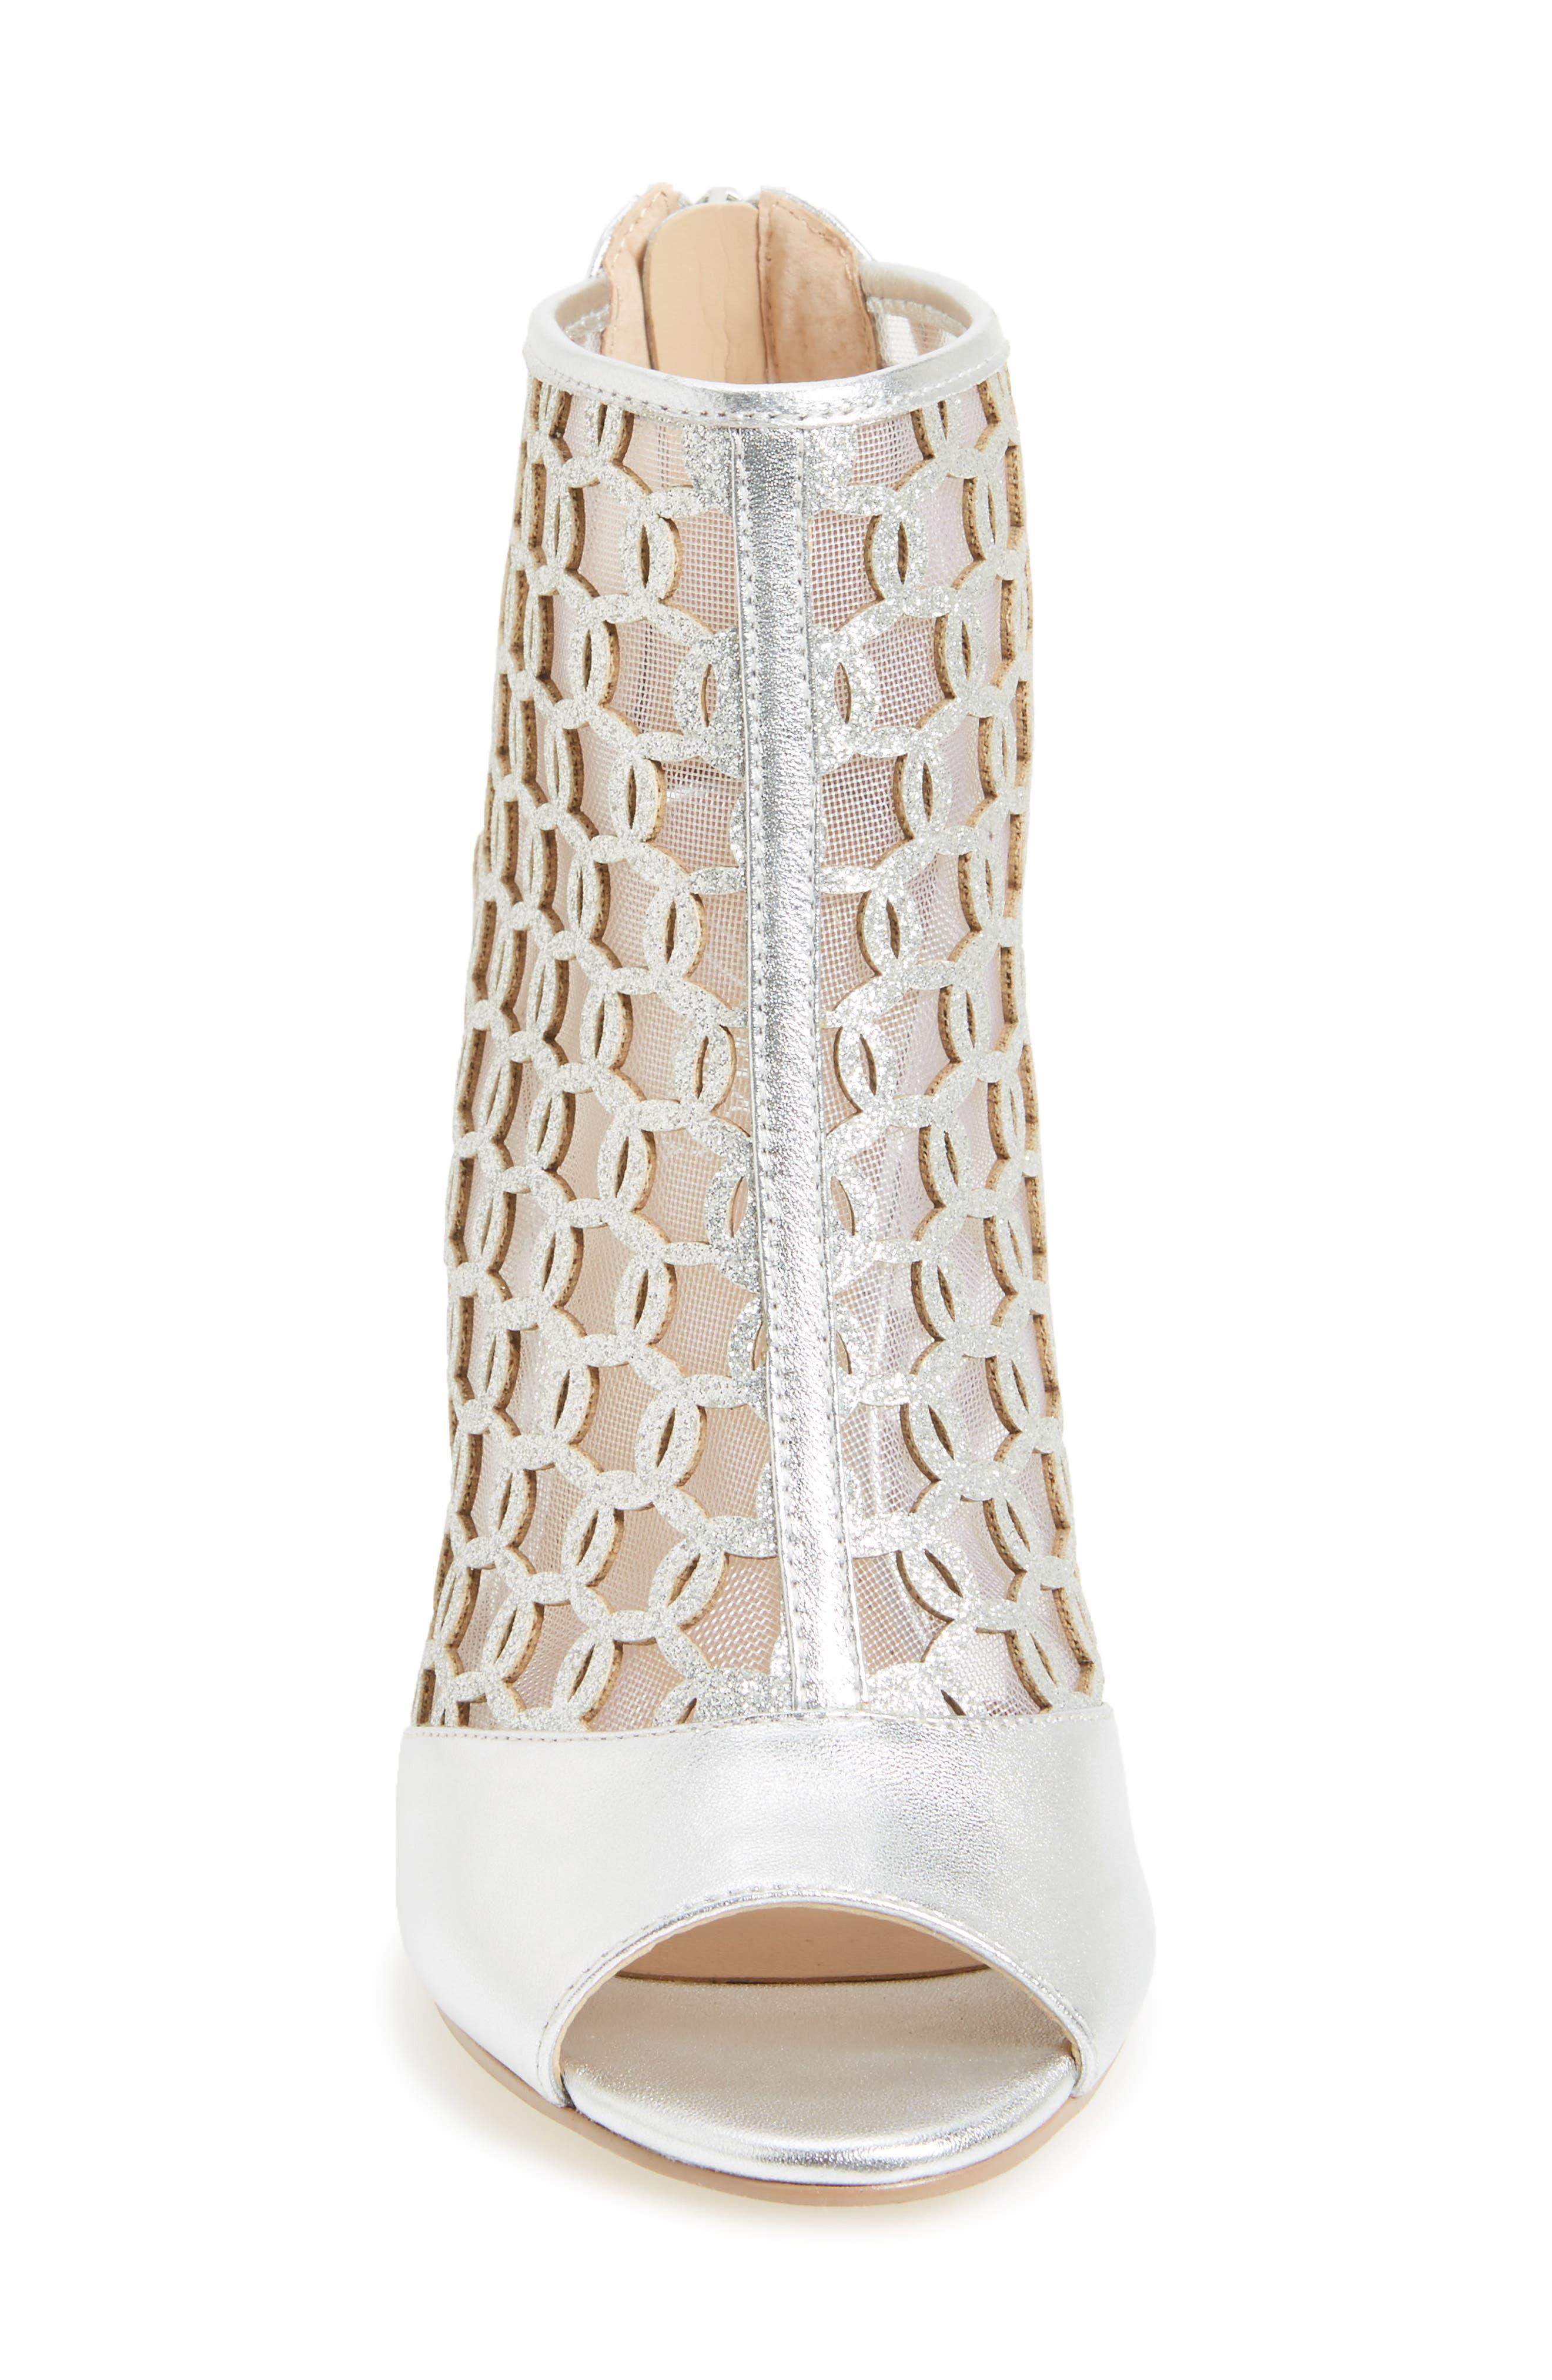 Alternate Image 3  - Jewel Badgley Mischka Holt II Glittery Cage Sandal (Women)